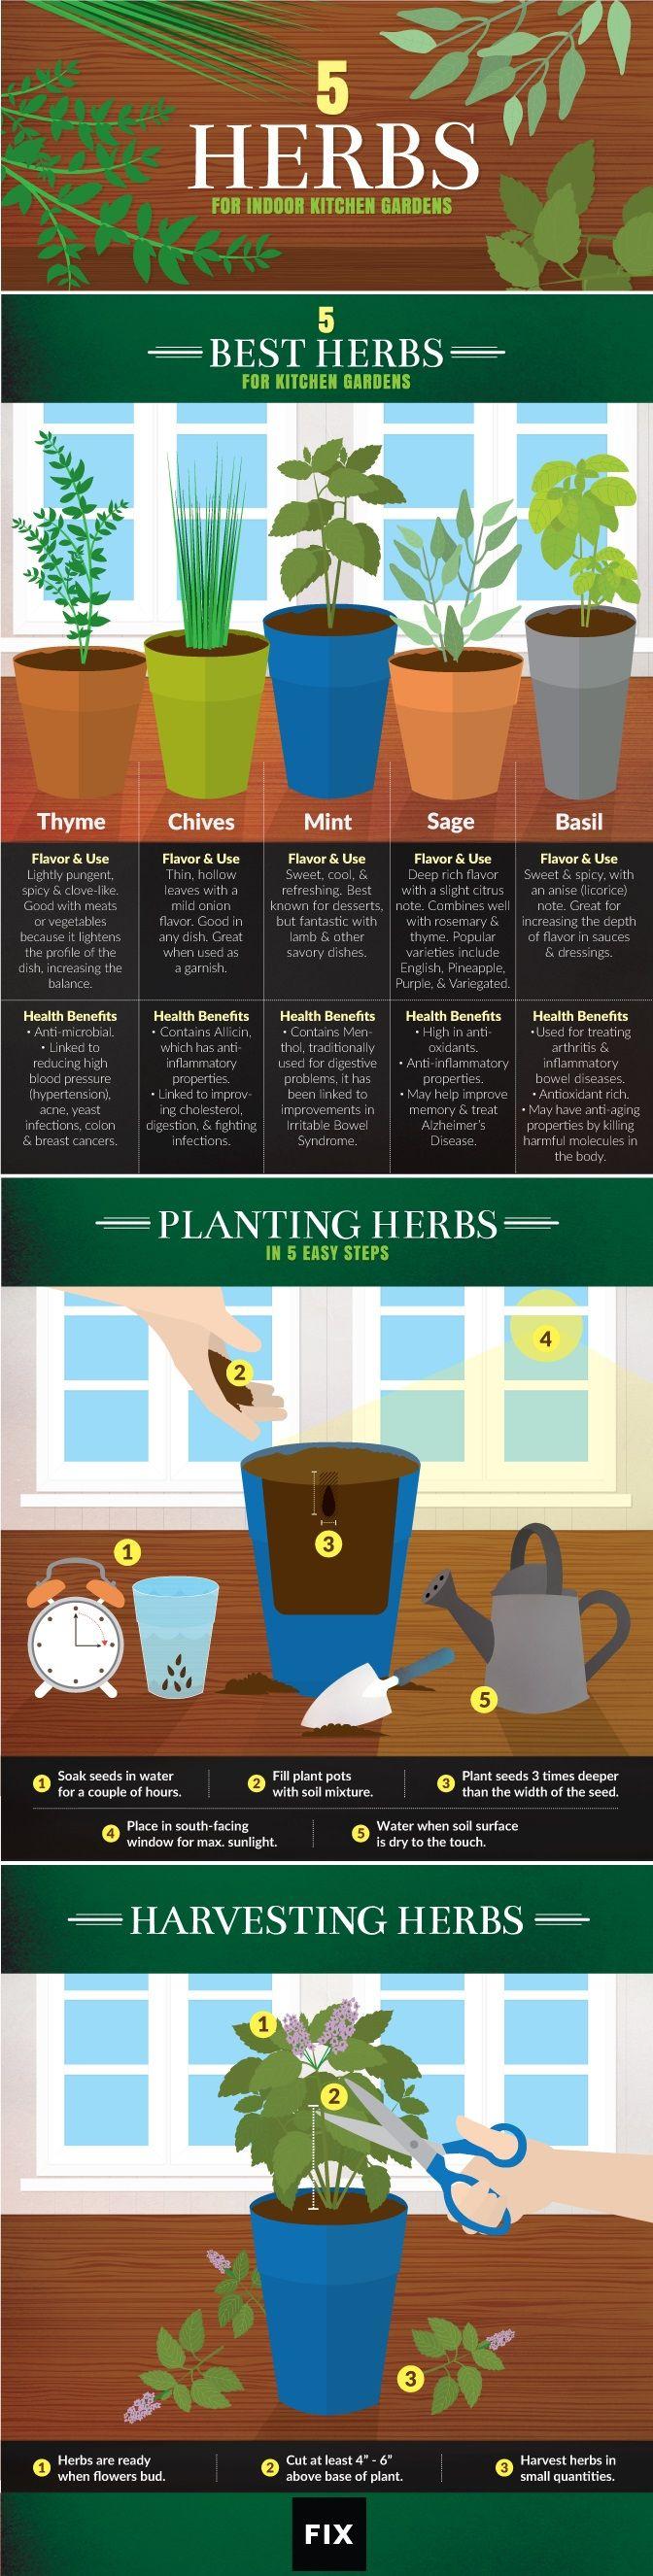 5 Best Herbs to Grow in Your Kitchen Garden: http://homeandgardenamerica.com/kitchen-garden-herbs